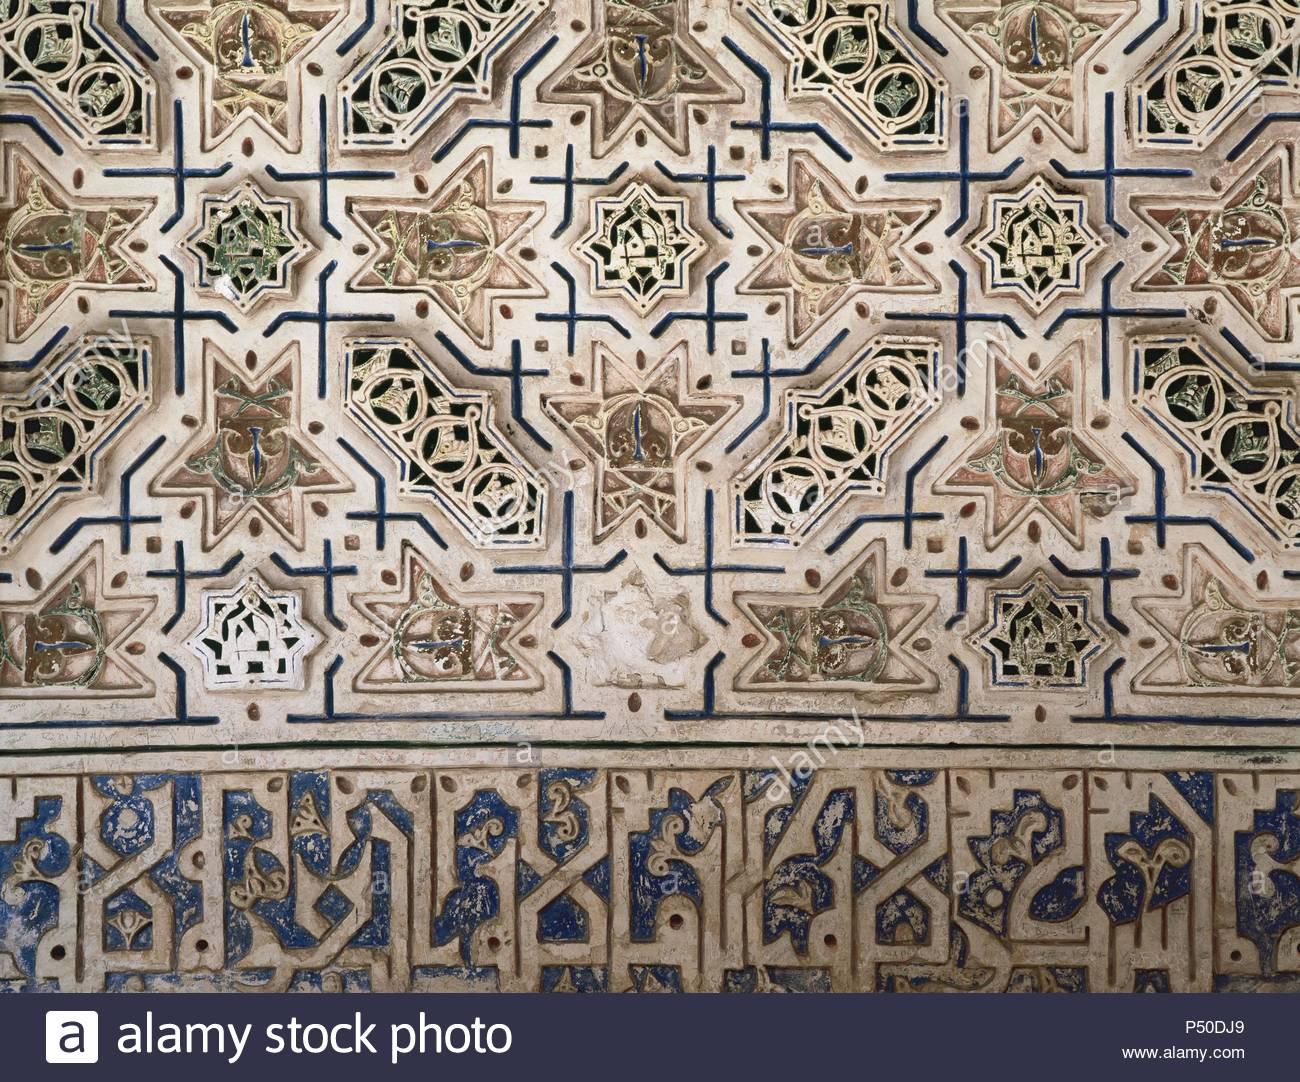 Spain. Toledo. Monastery of Saint John of the Kings. 15th - 16th centuries. Gothic-spanish-flemish style. Decoration. Detail. - Stock Image